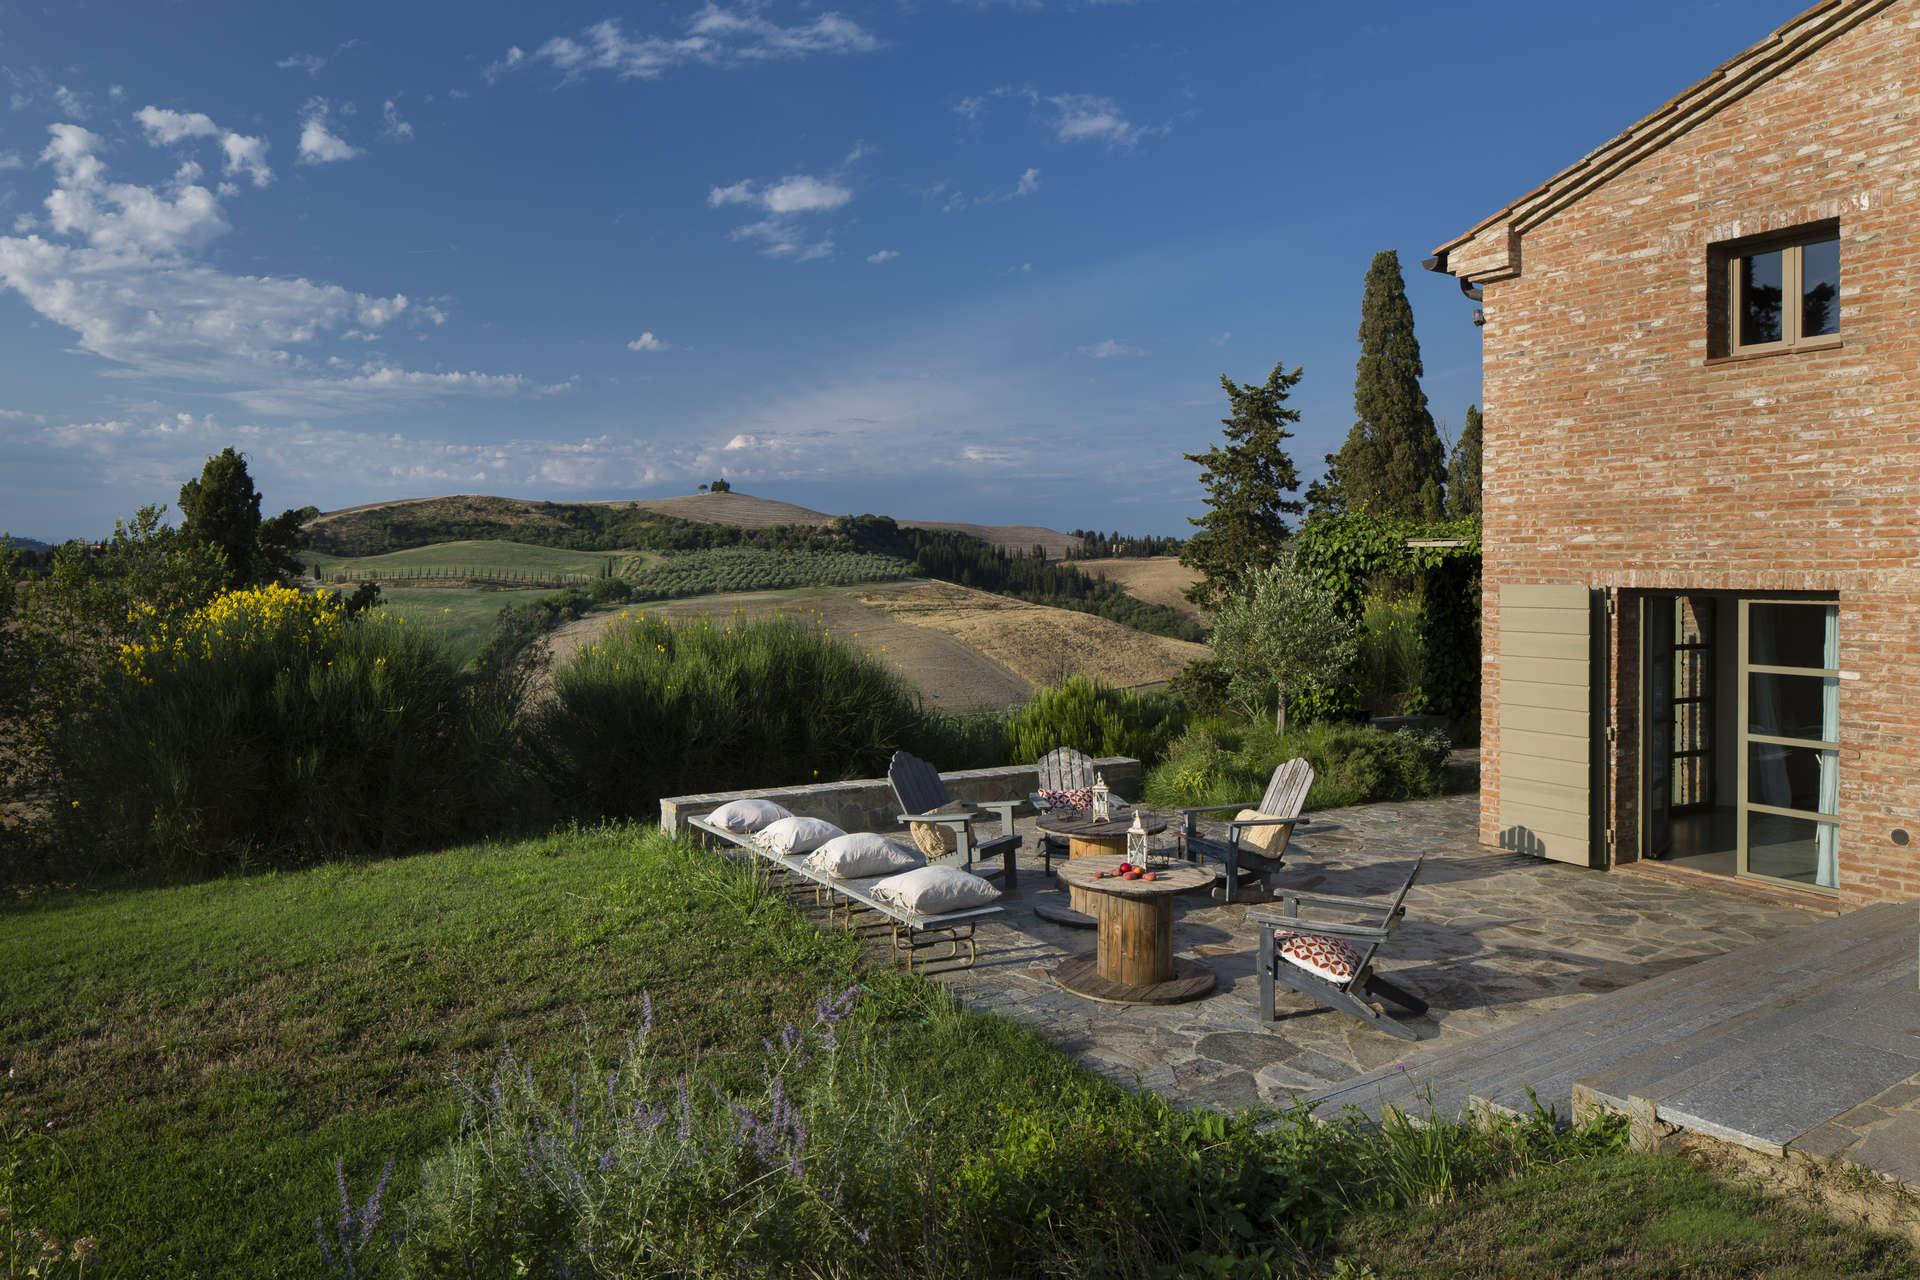 Luxury vacation rentals europe - Italy - Tuscany - Castelfalfi - Villa Campera - Image 1/31